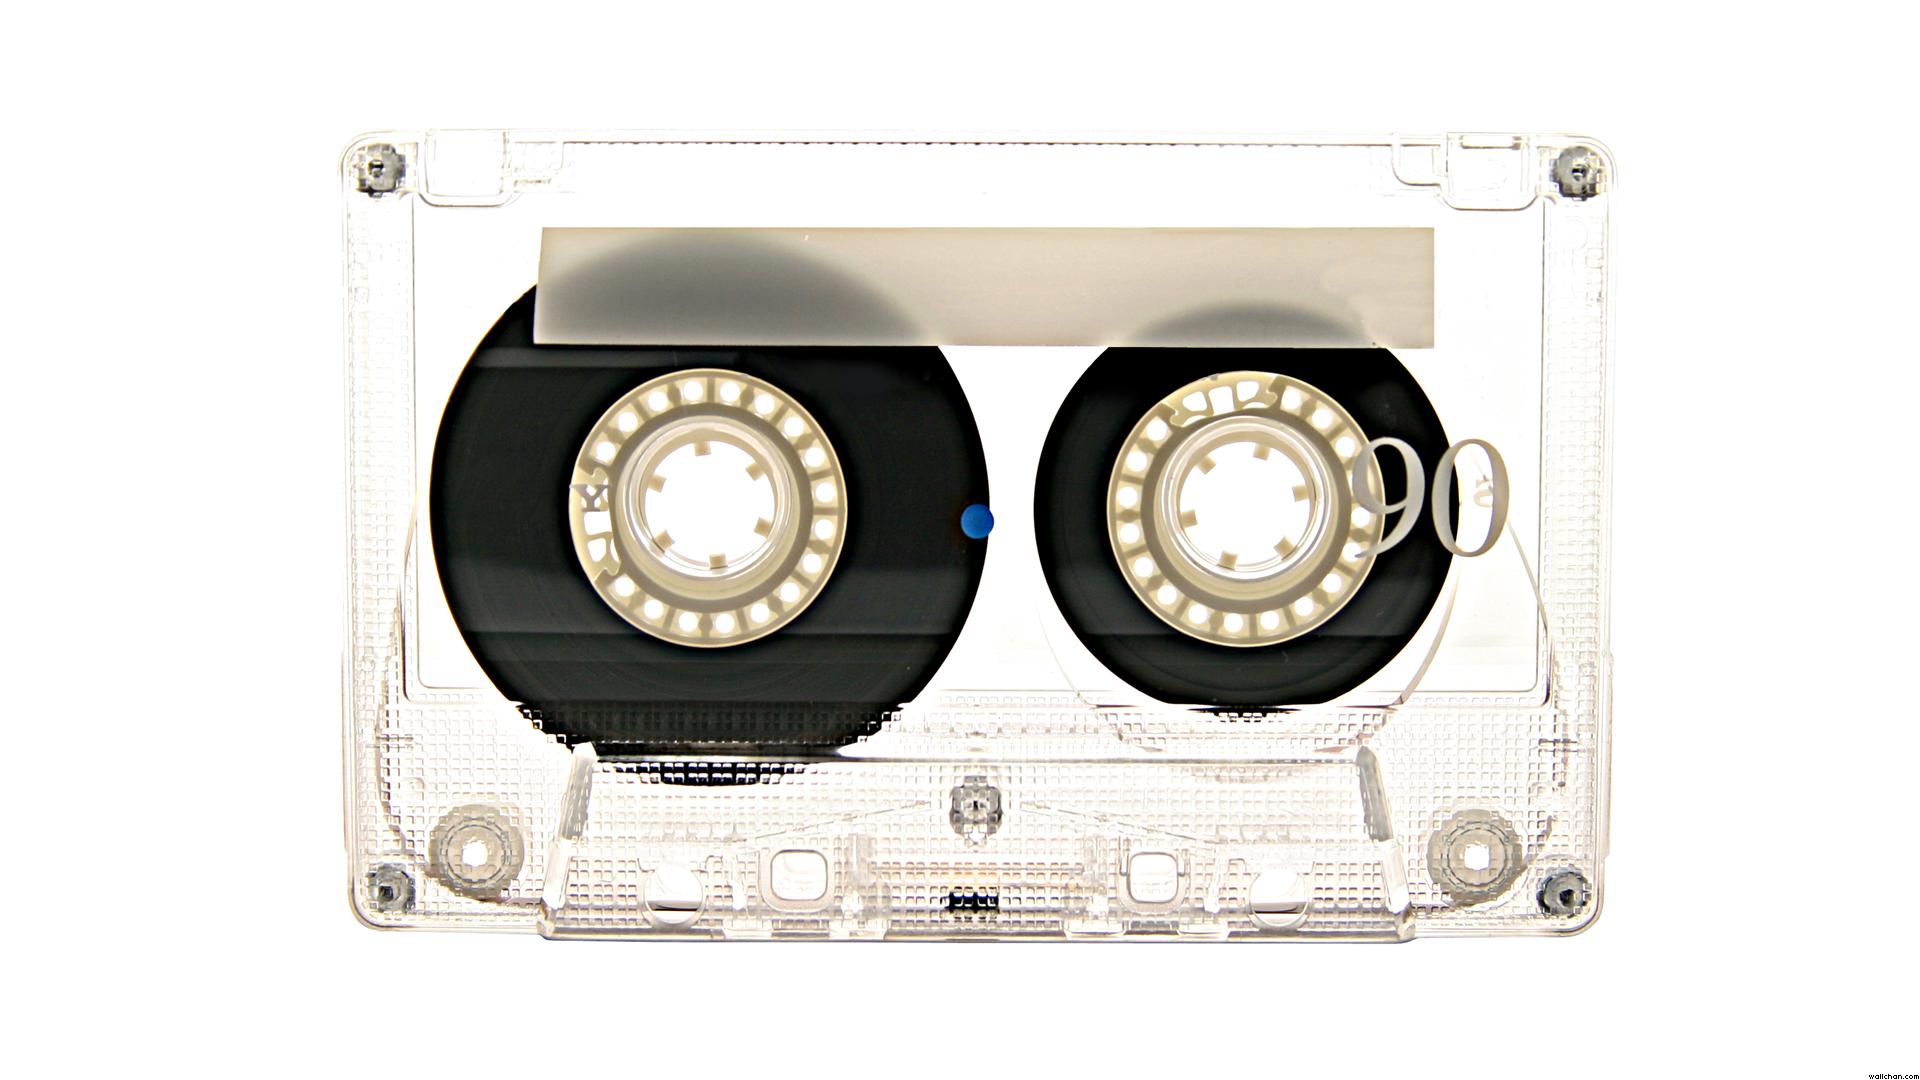 Casette HD PNG - 93864